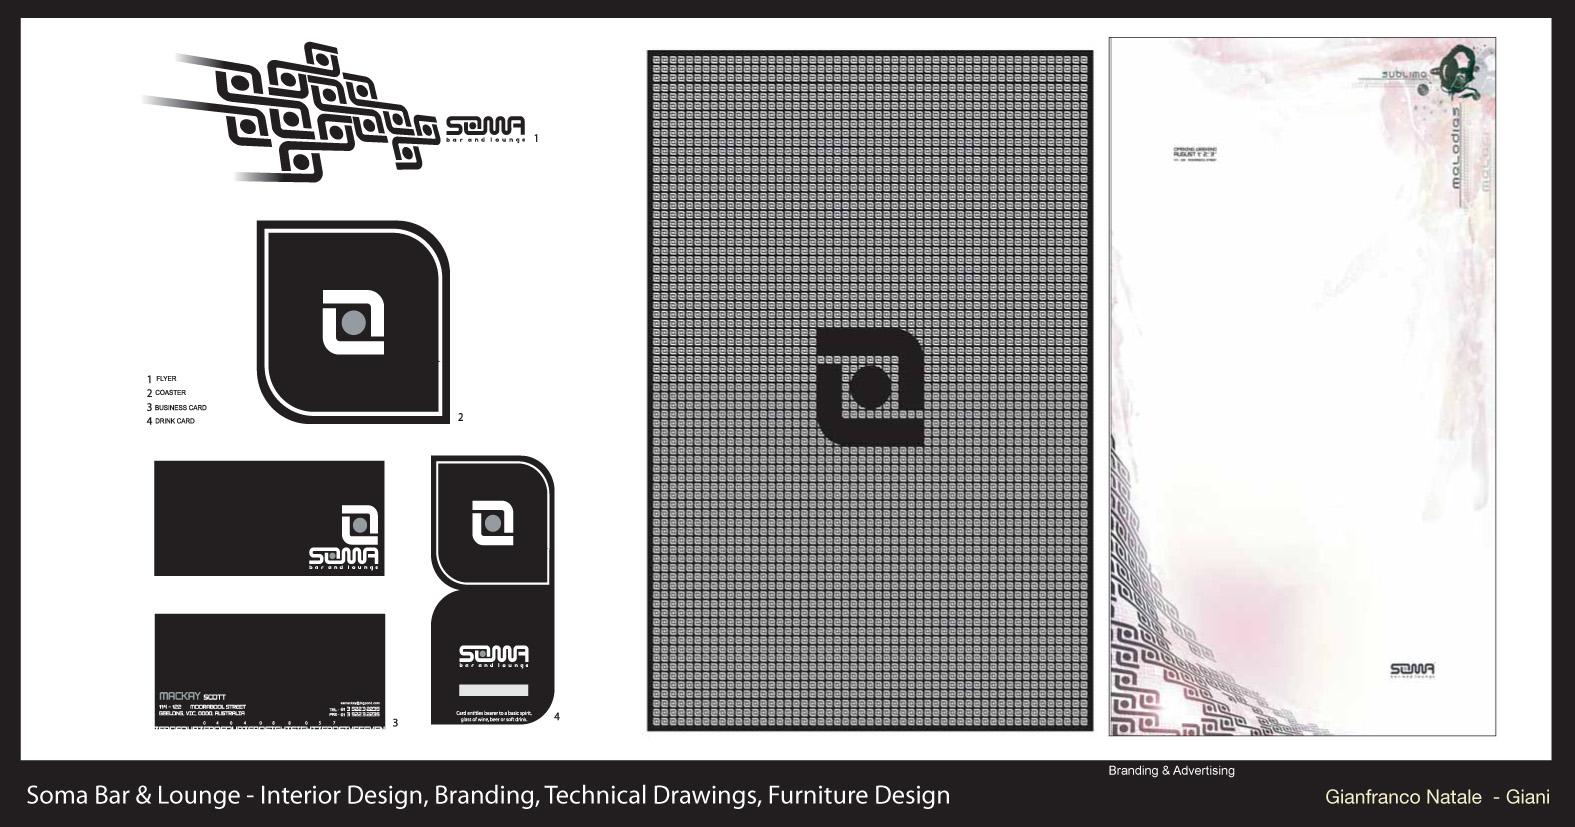 Night Club Design - Brand Experience